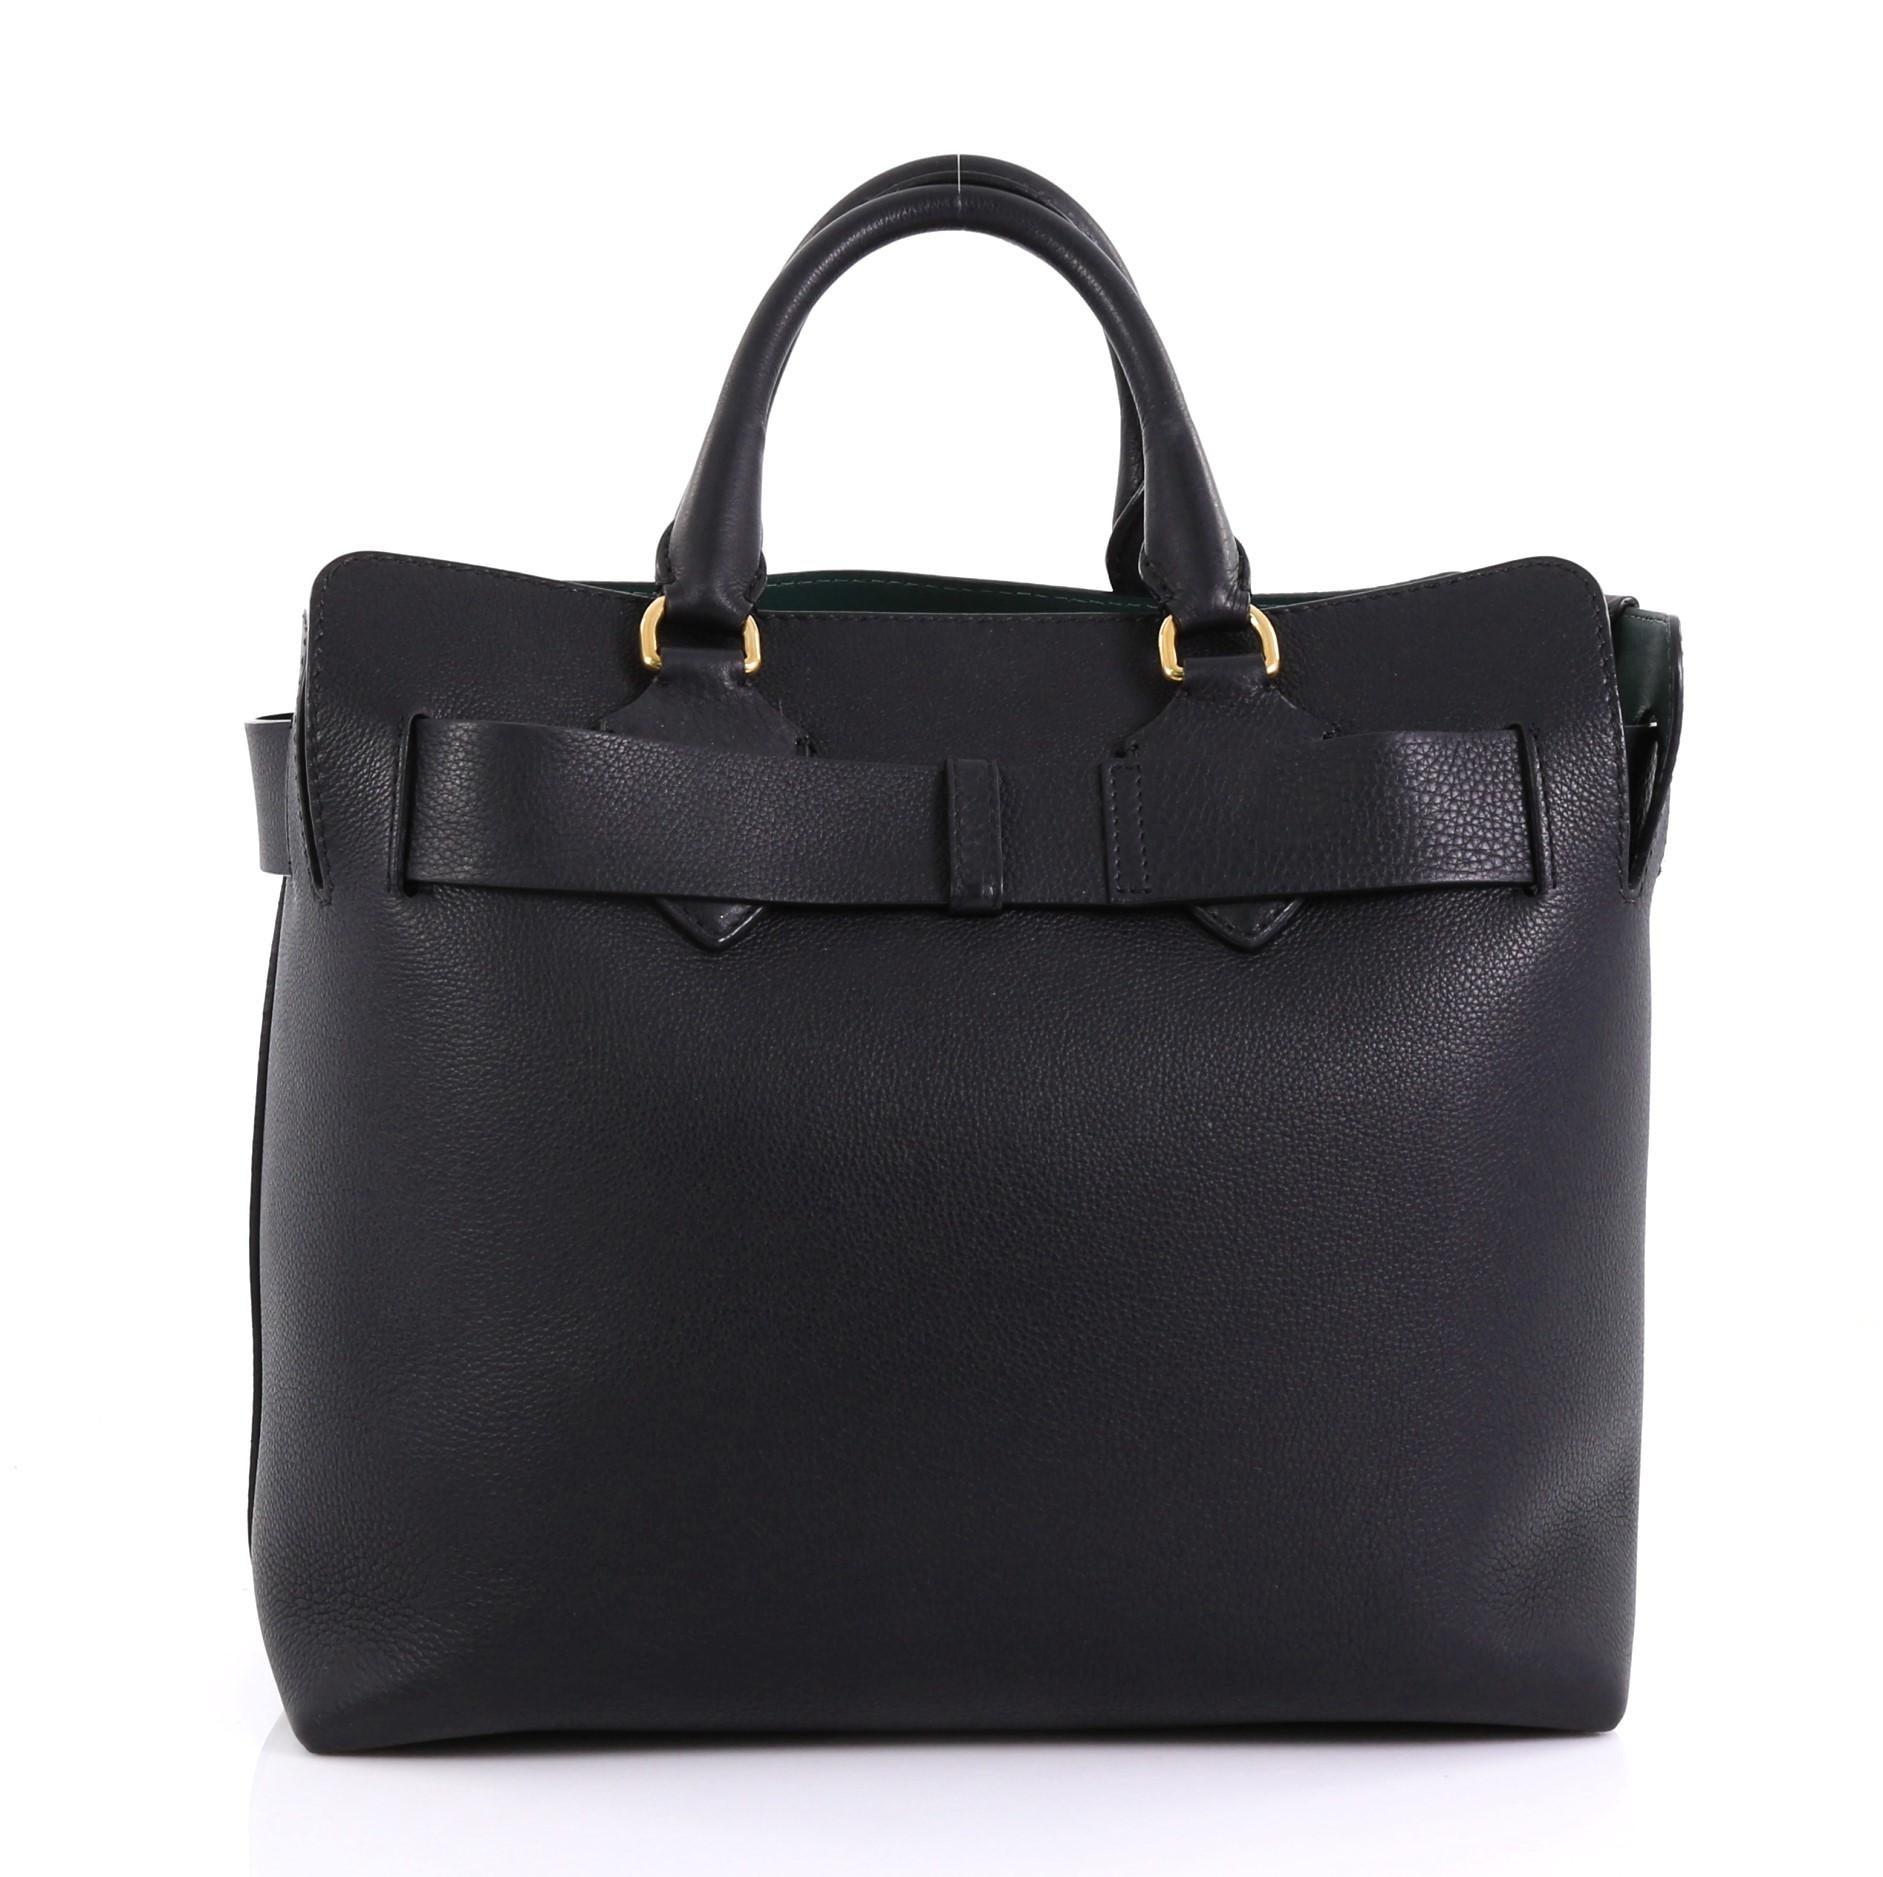 25924e388baf Burberry Belt Tote Leather Medium For Sale at 1stdibs